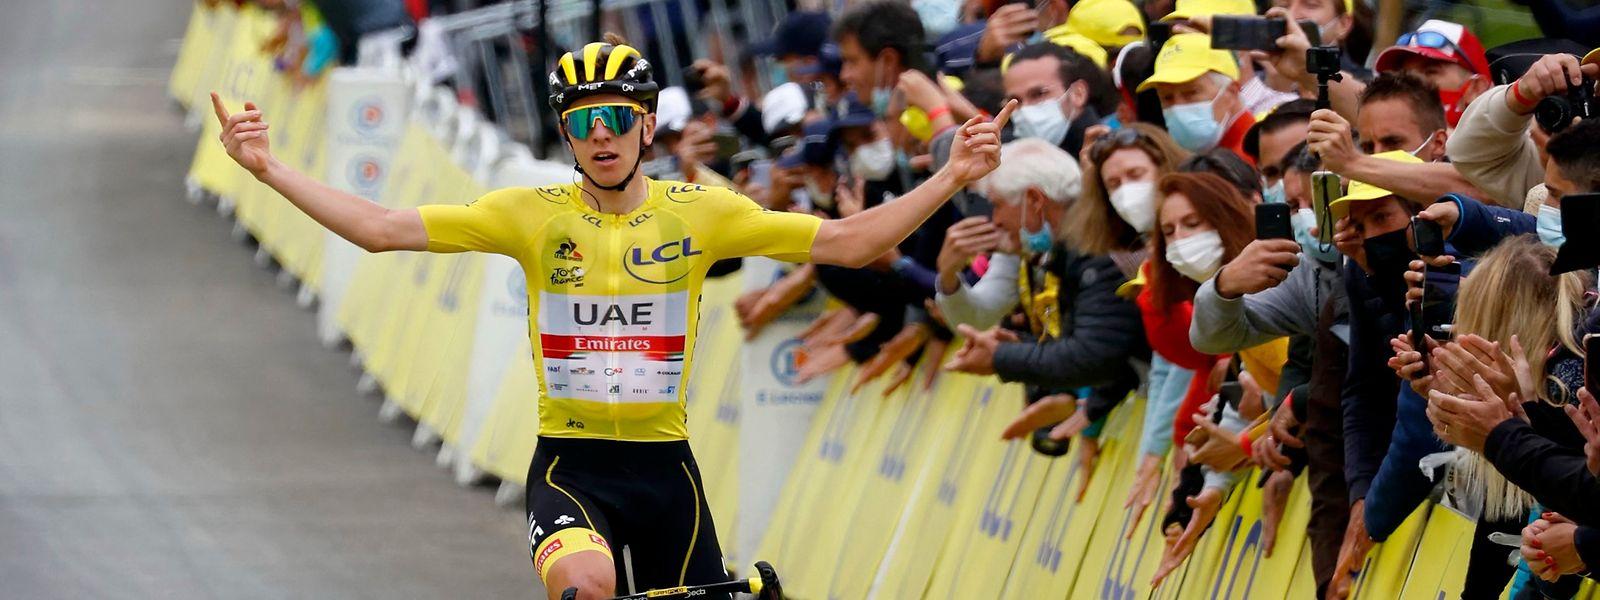 Tadej Pogacar drückt der Tour de France weiter seinen Stempel auf.